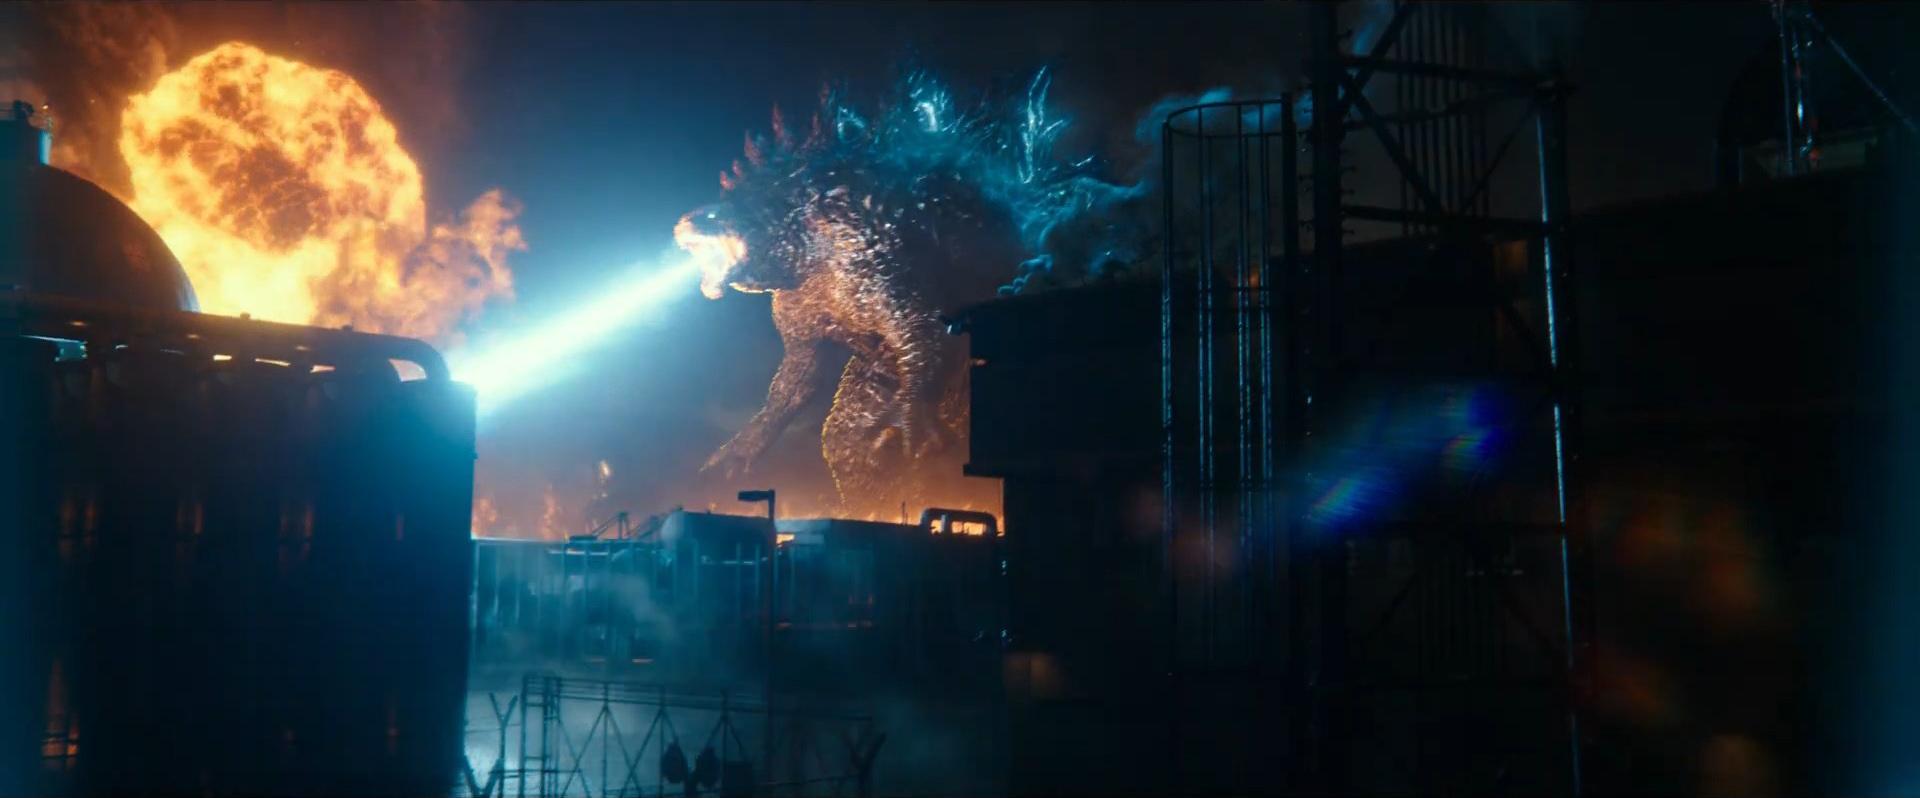 Godzilla vs Kong Trailer Still 54 - Godzilla Atomic Breath